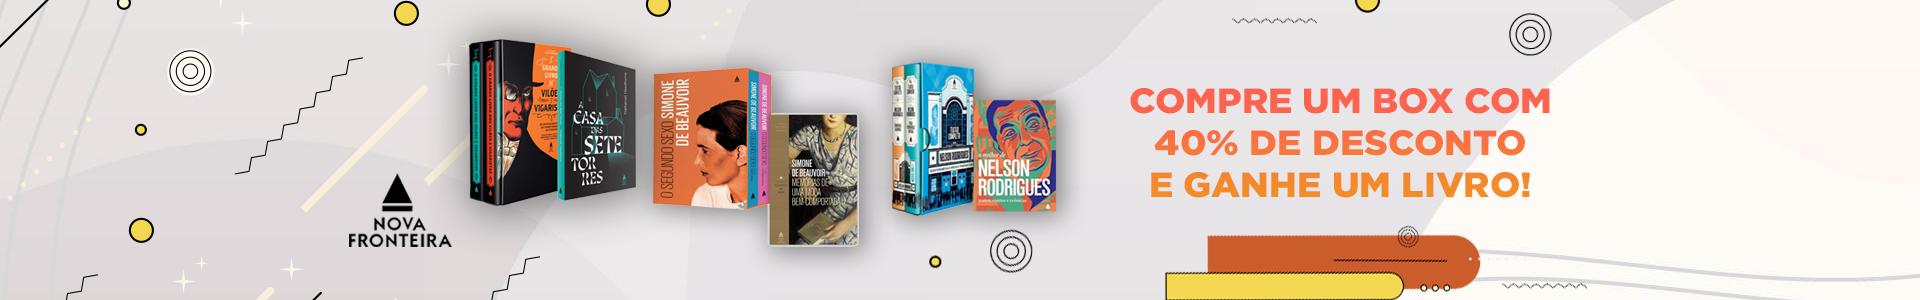 Kit Box Nova Fronteira - Desktop